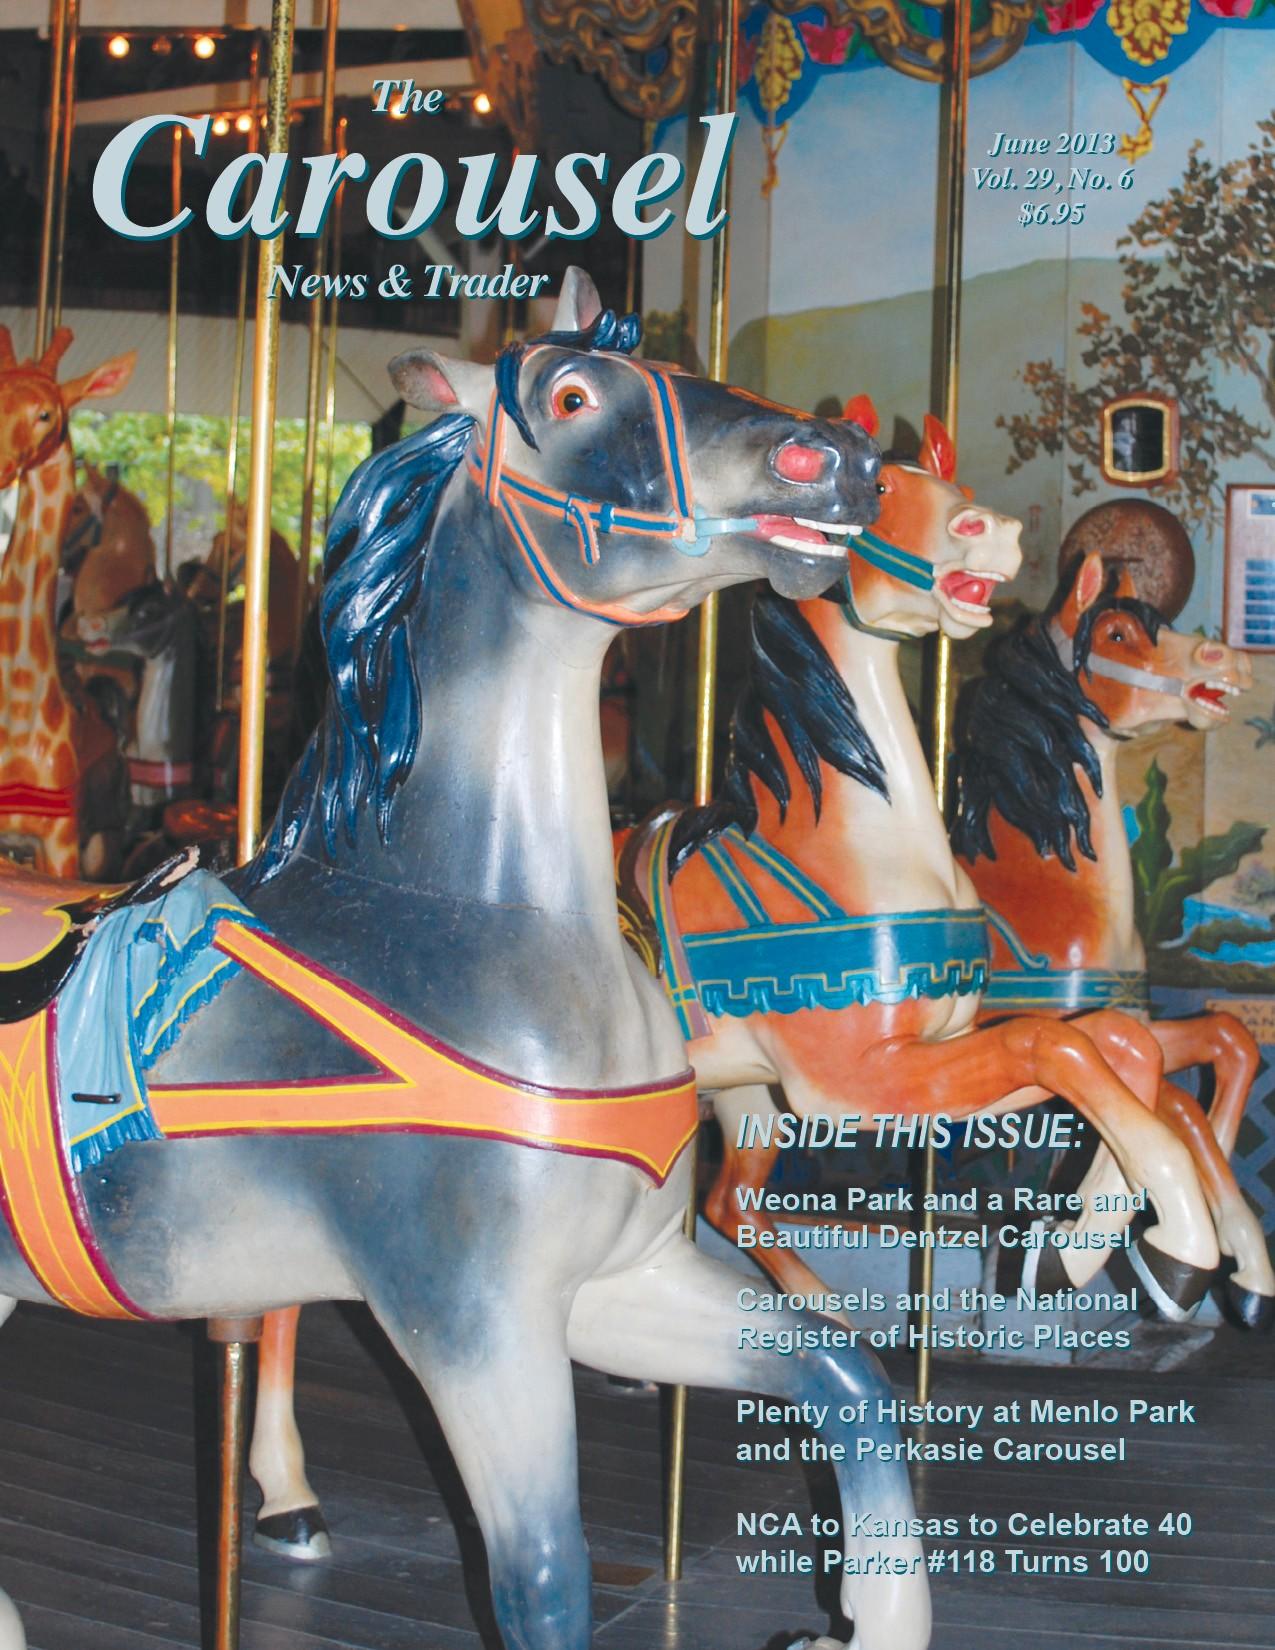 Carousel-news-cover-6-Pen-Argyl-Weona-Park-carousel-June-2013